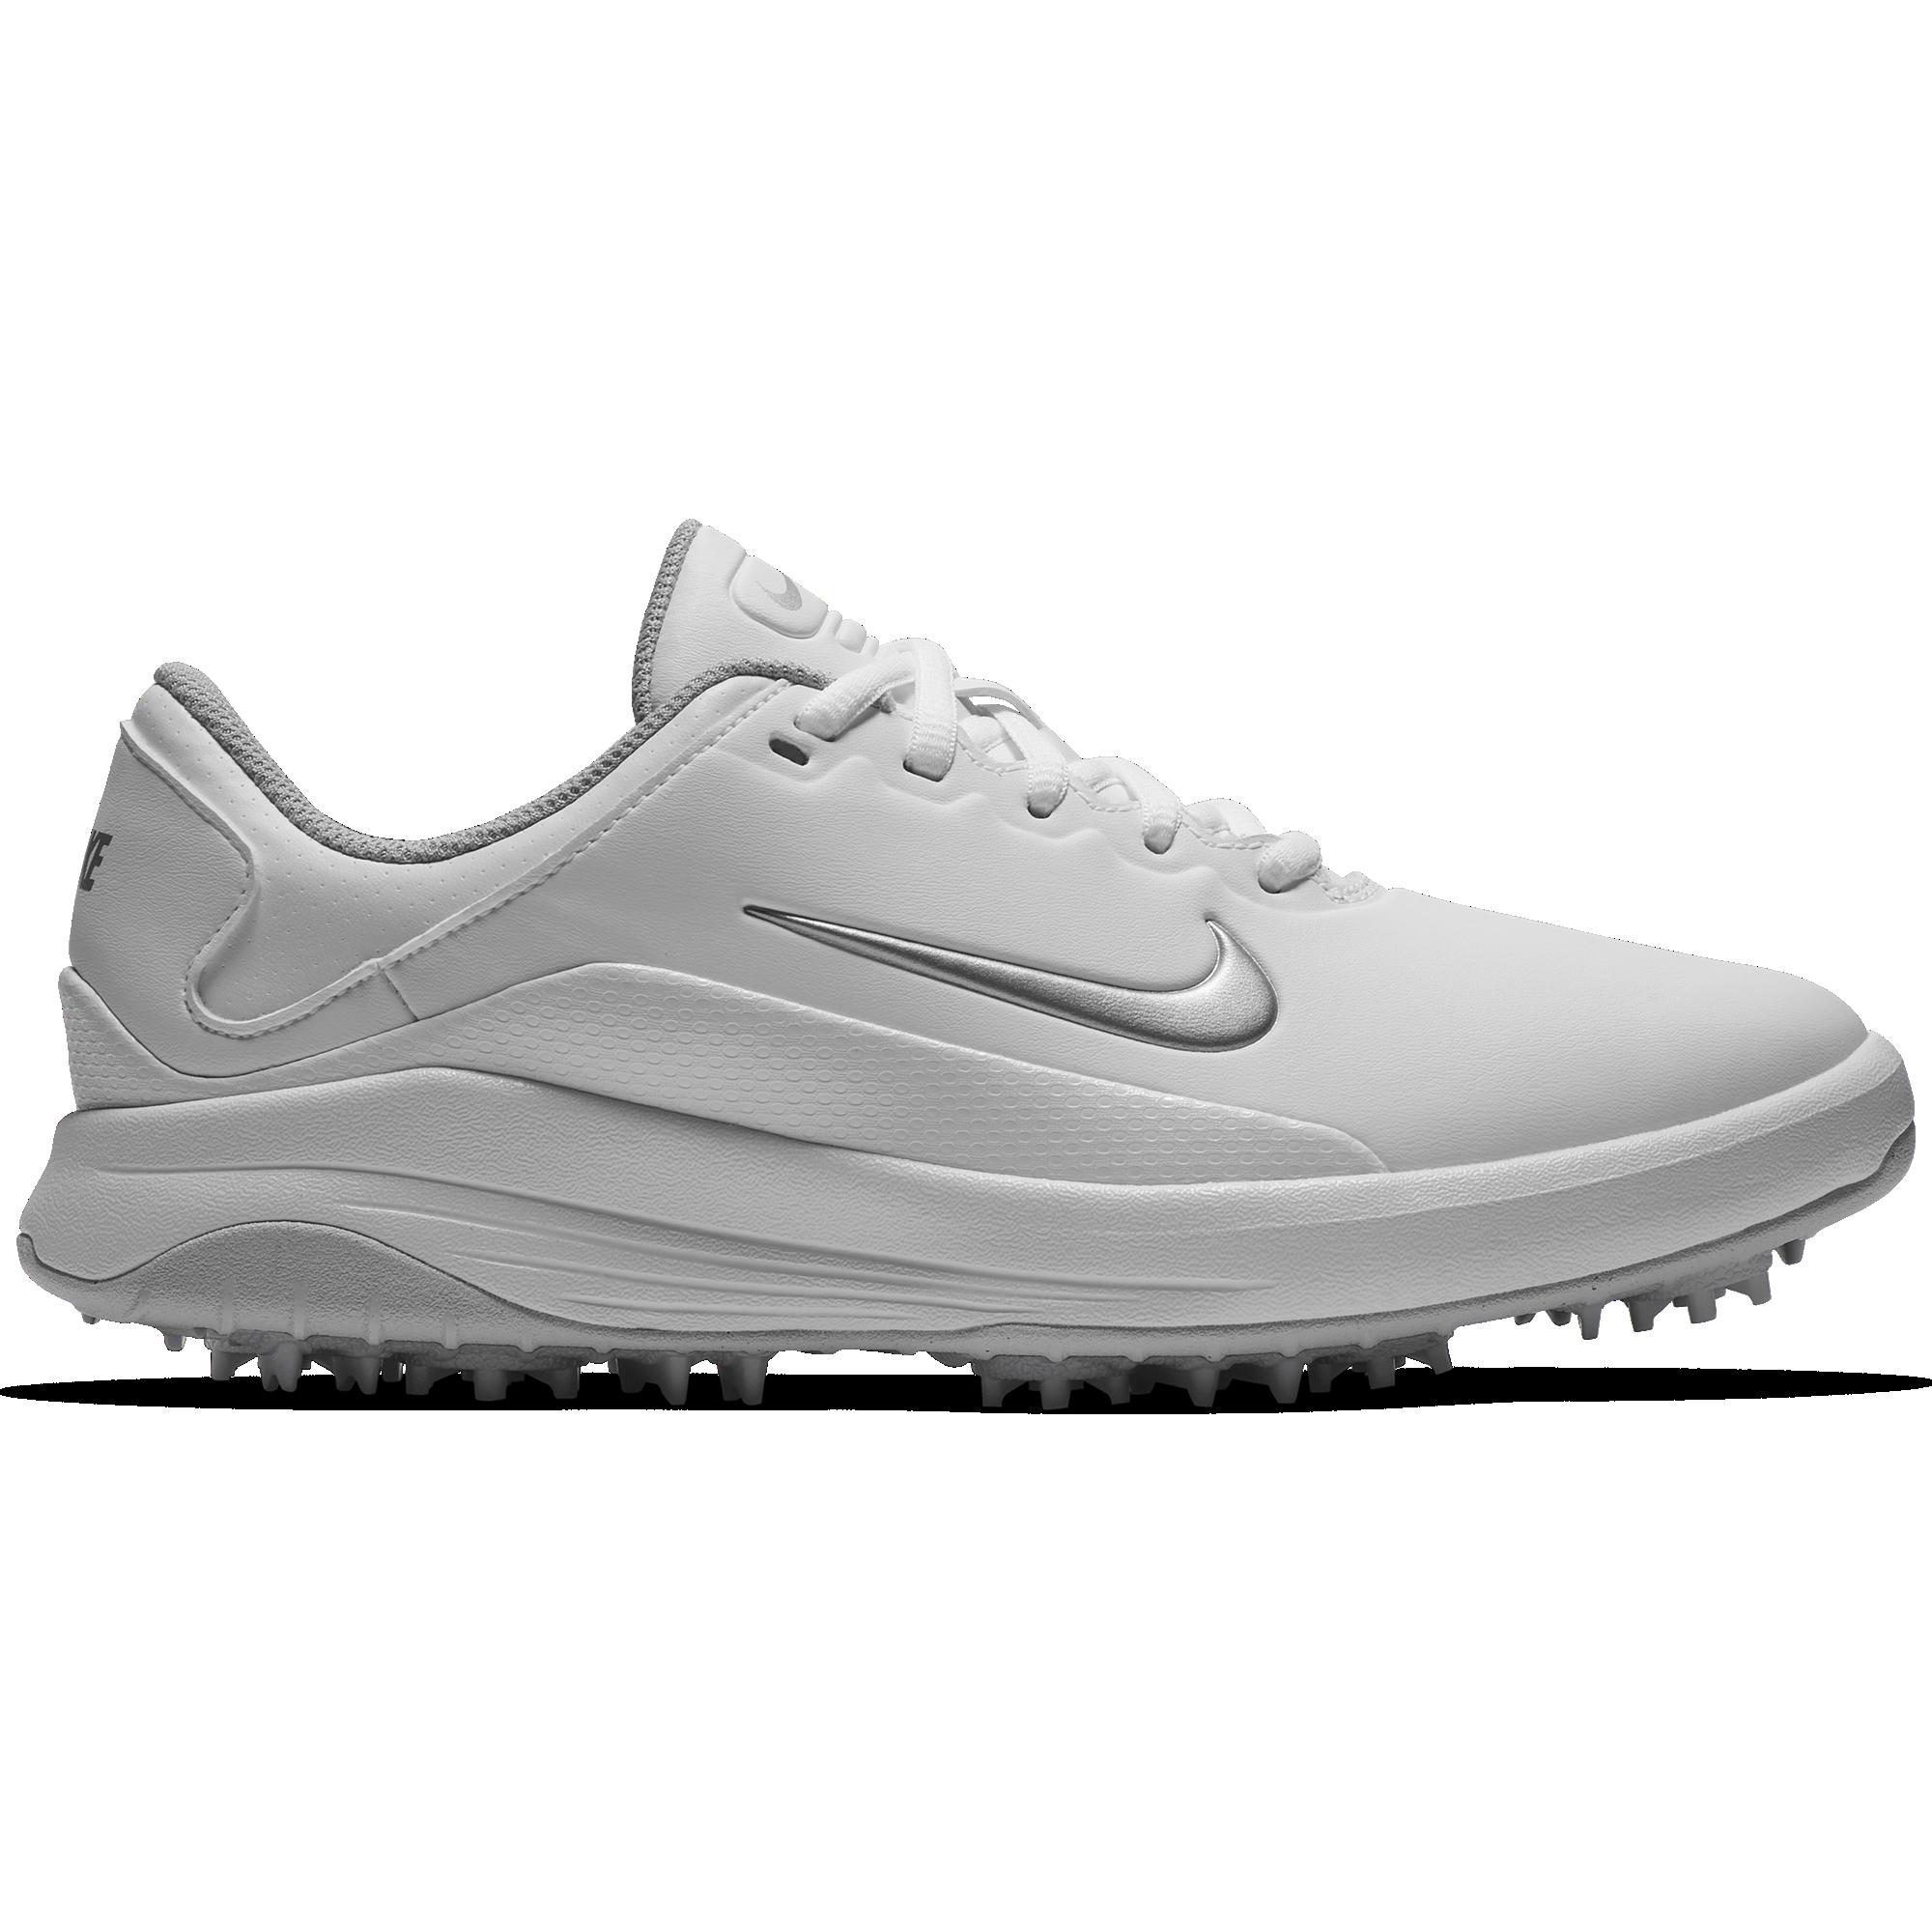 Nike Vapor Women's Golf Shoe - White